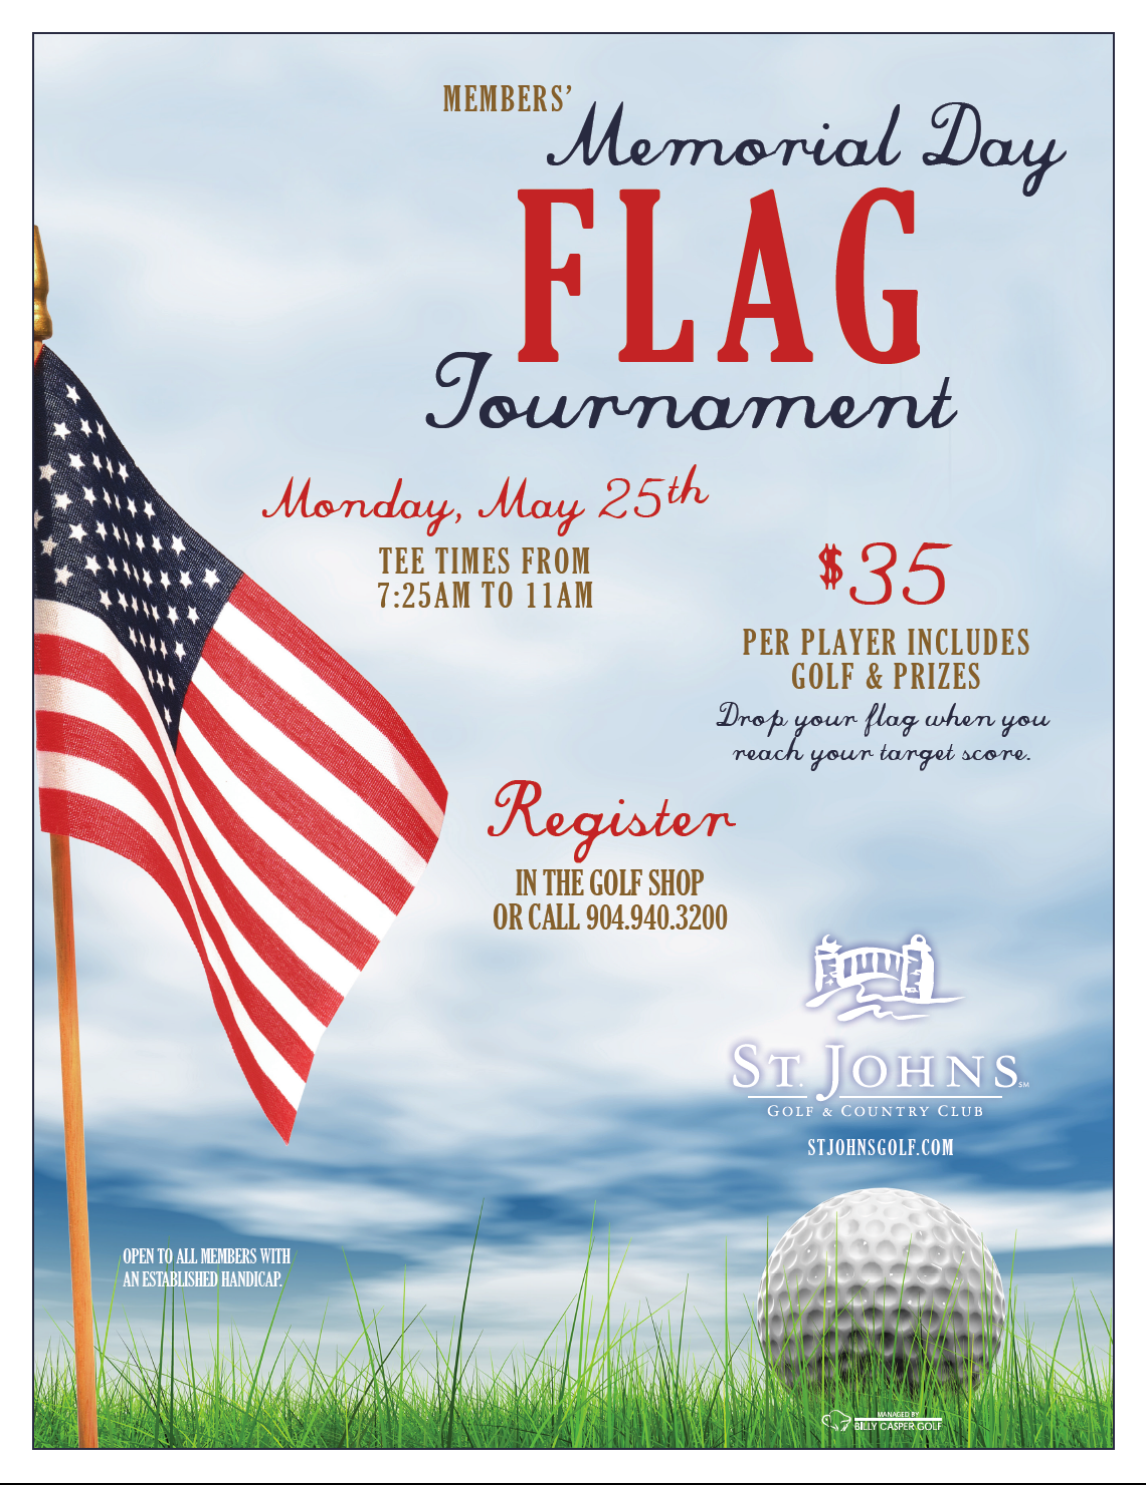 Flag Tournament 5/25/15 St. Johns Golf & Country Club St. Augustine, FL